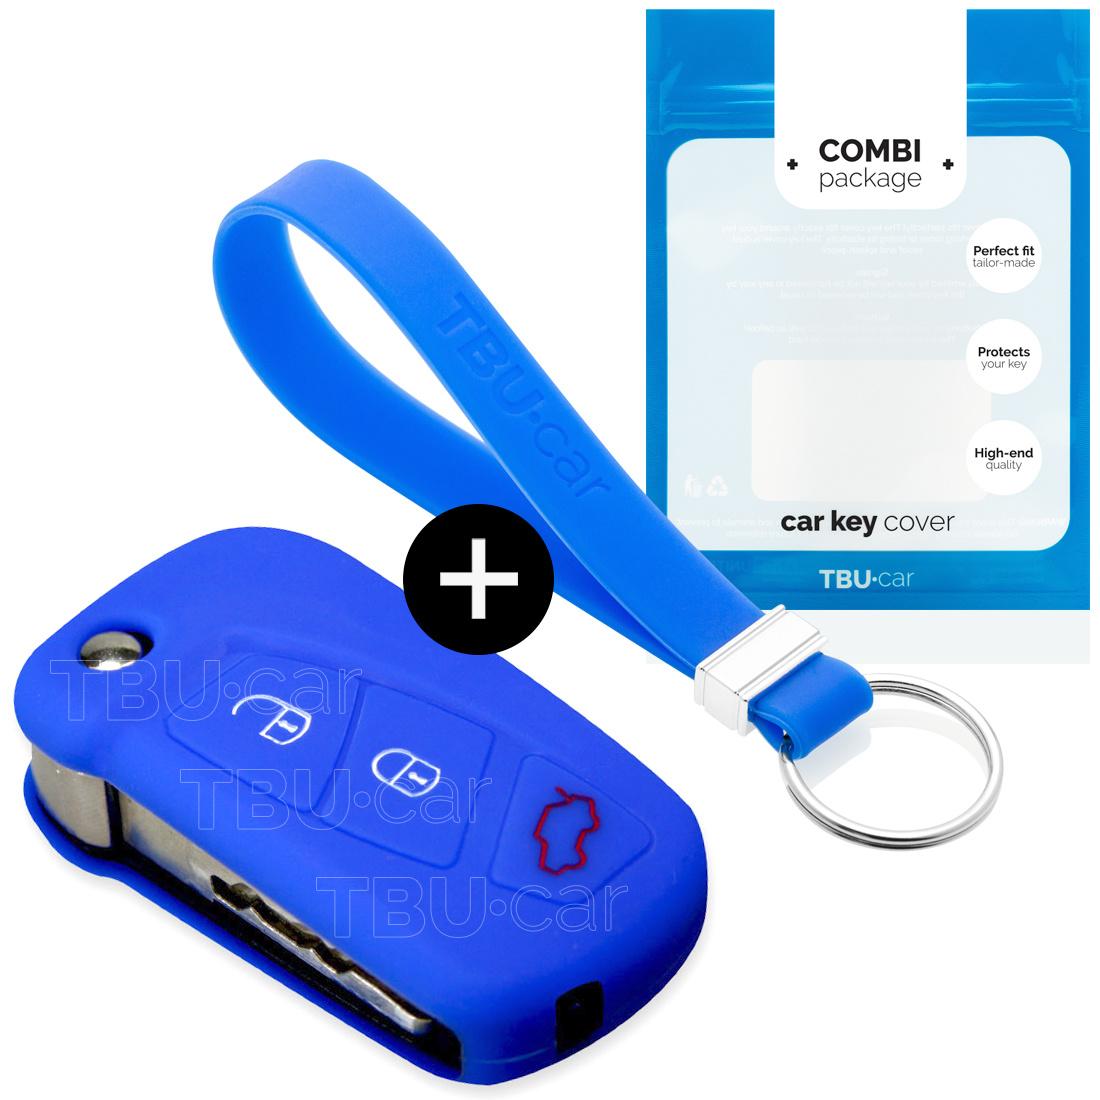 TBU car TBU car Autoschlüssel Hülle kompatibel mit Ford 3 Tasten (KA) - Schutzhülle aus Silikon - Auto Schlüsselhülle Cover in Blau